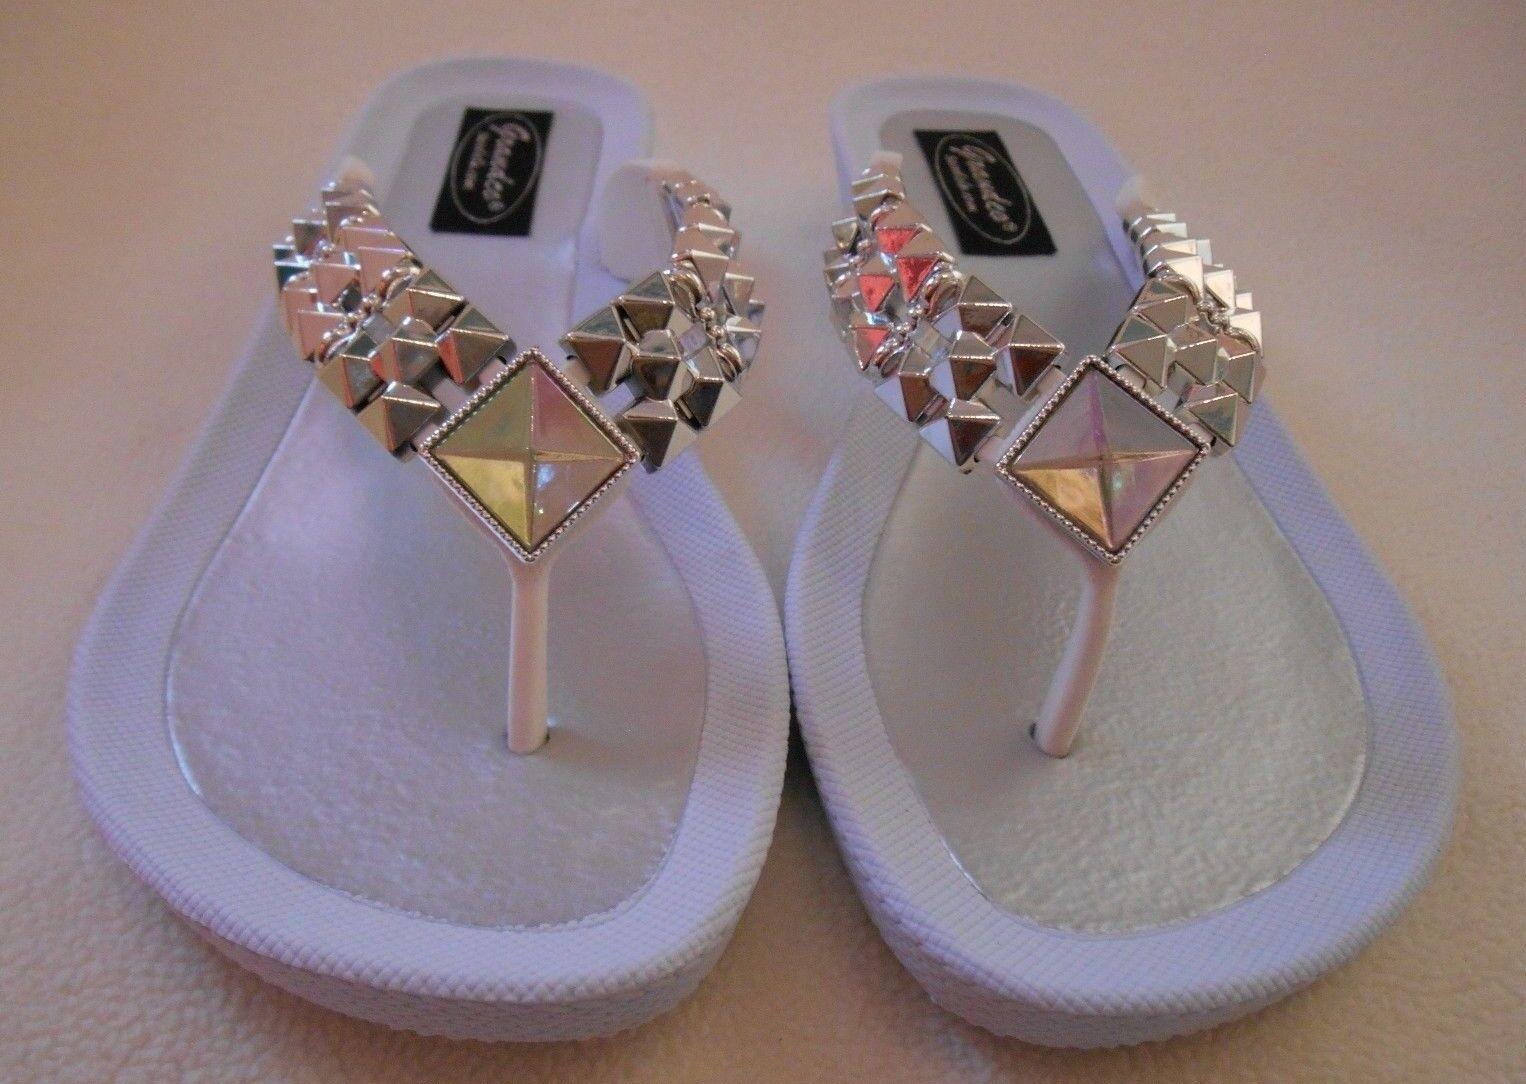 Reef Rover Catch Sandals - Women's - 5, Black/Mint